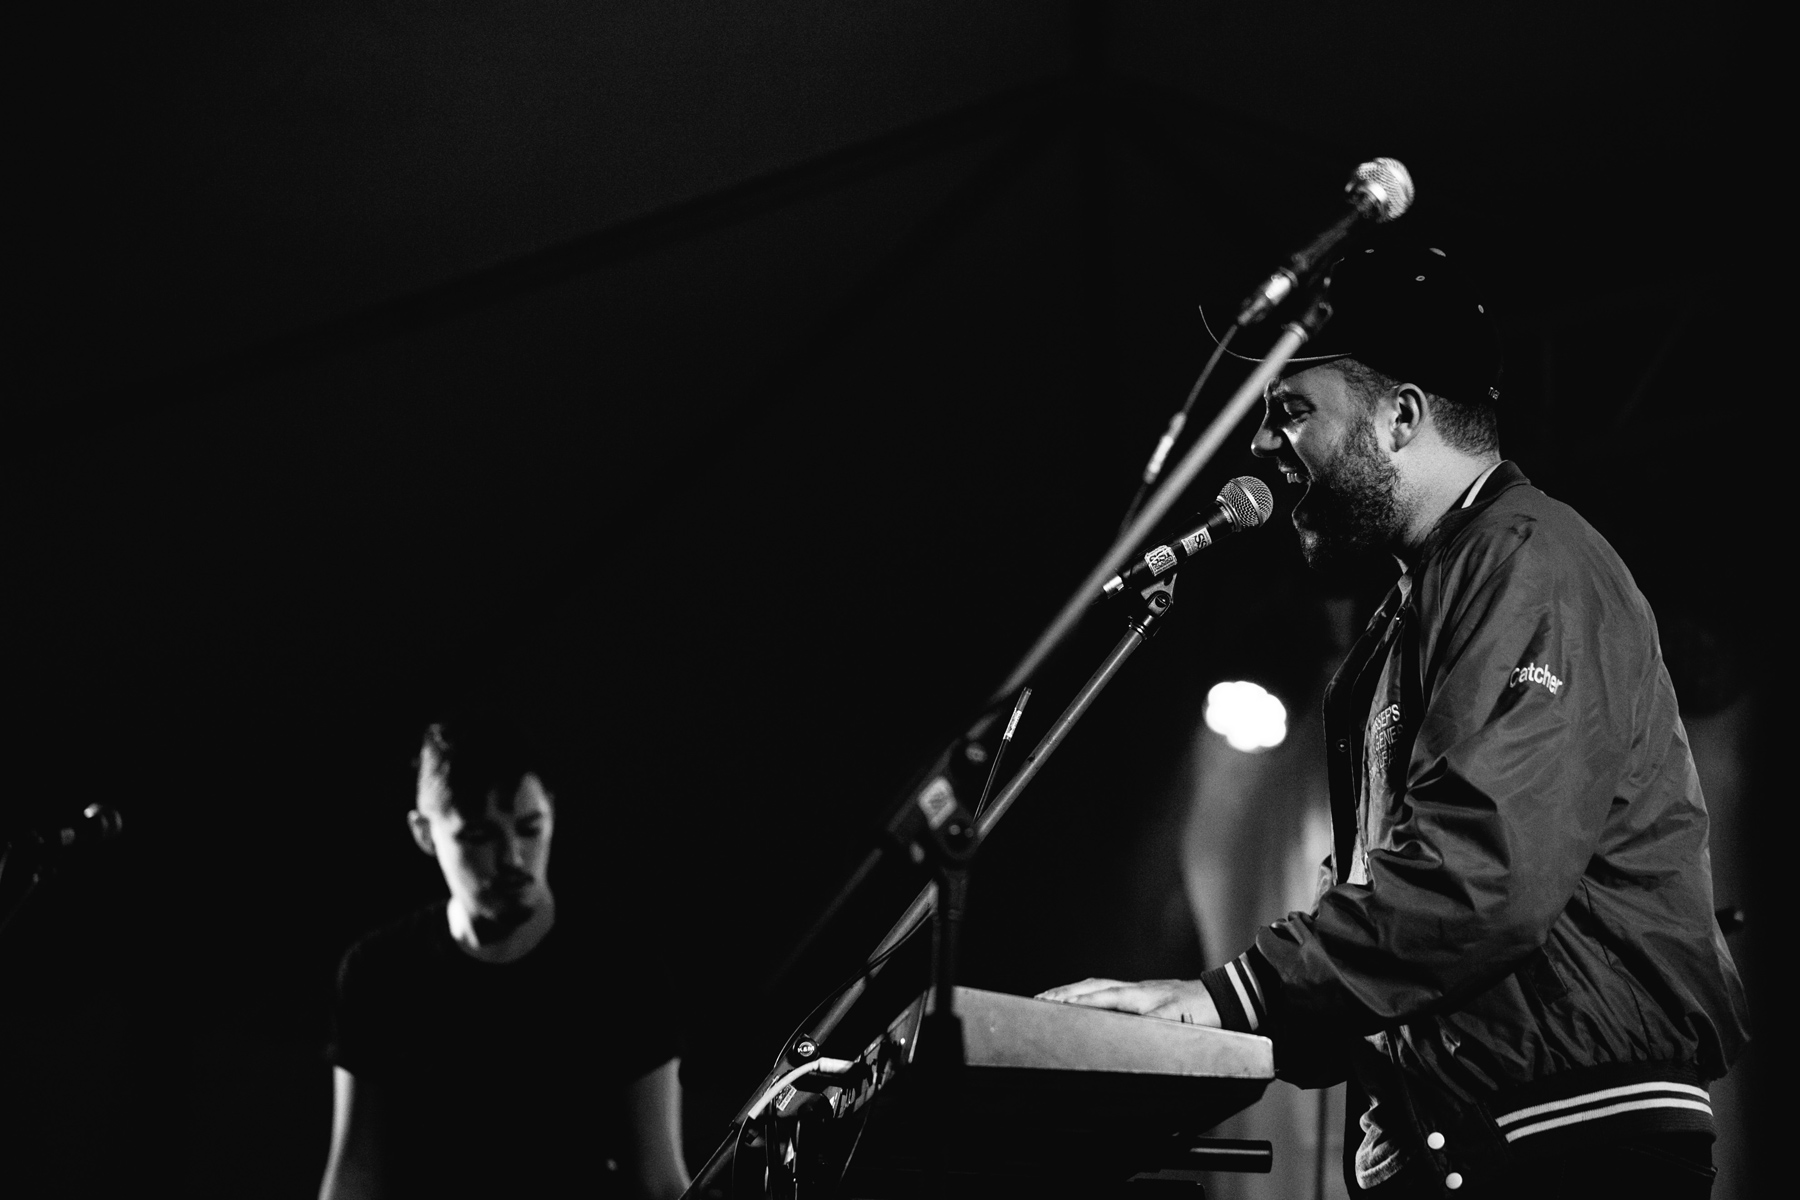 026-harvest-jazz-blues-festival-2017-kandisebrown